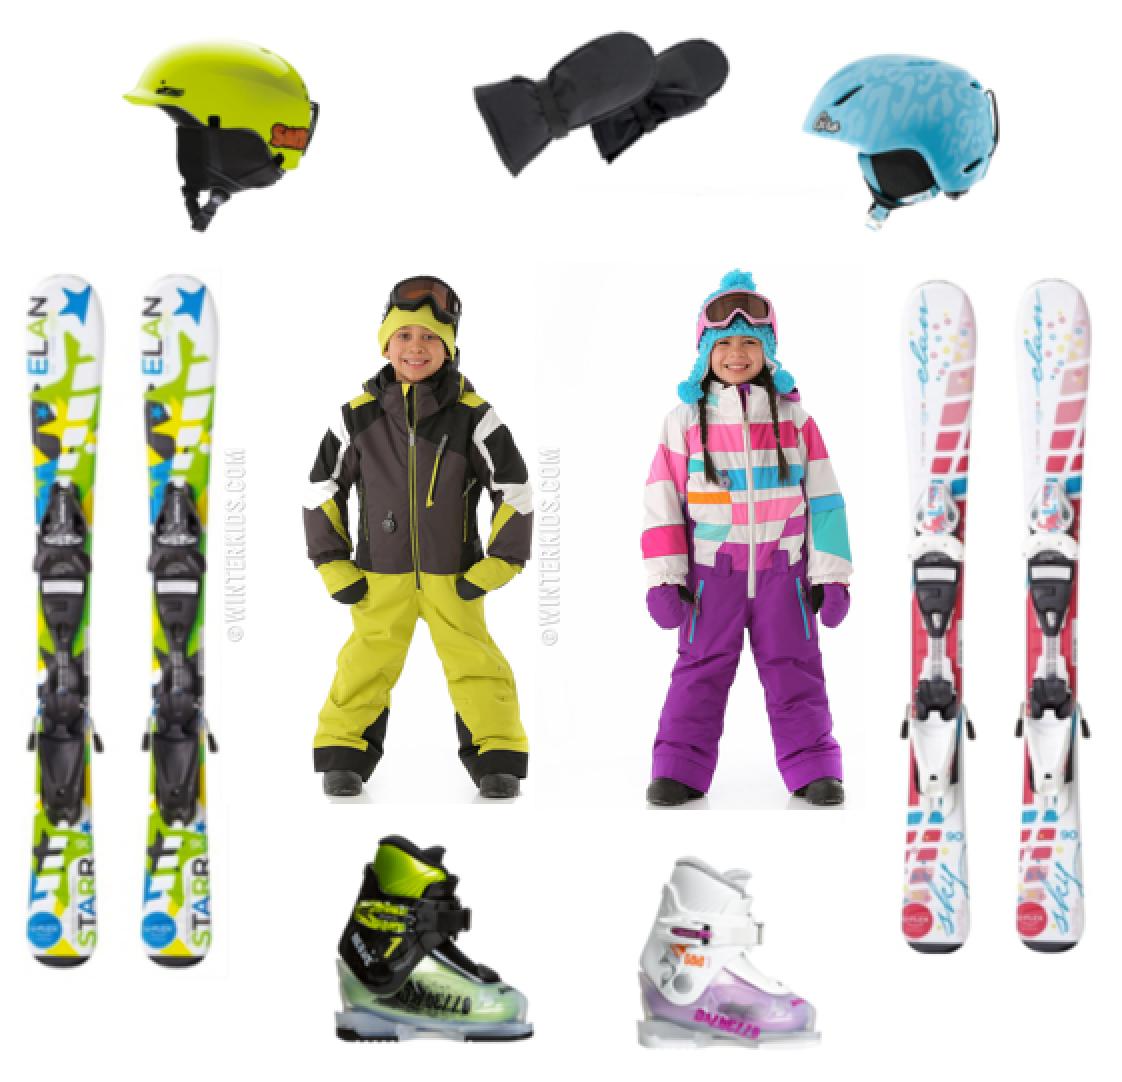 Cute Kids Ski Snow Gear Season